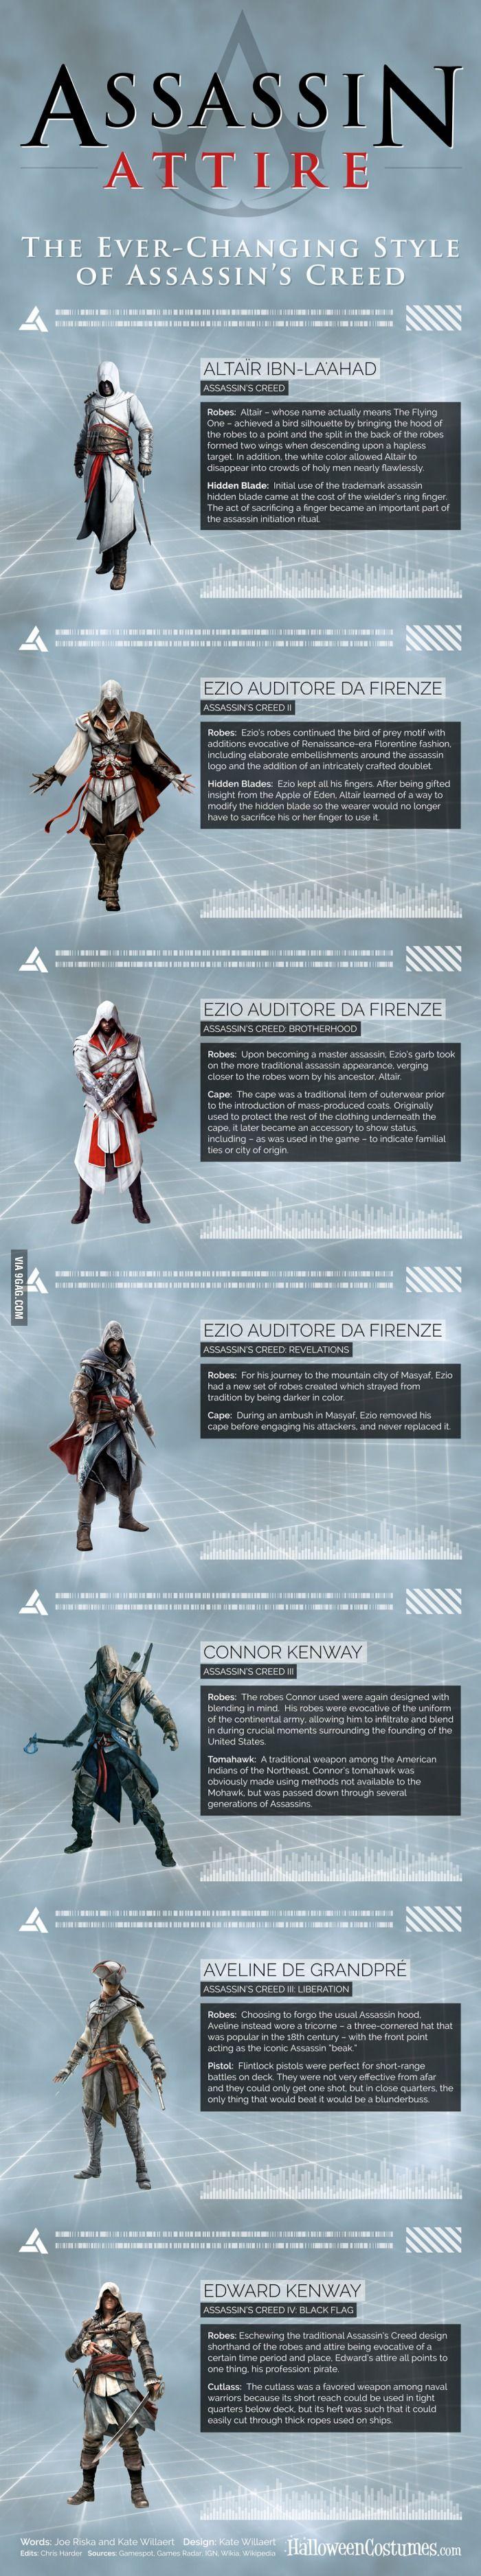 Assassin Attire - Assassin's Creed Infographic